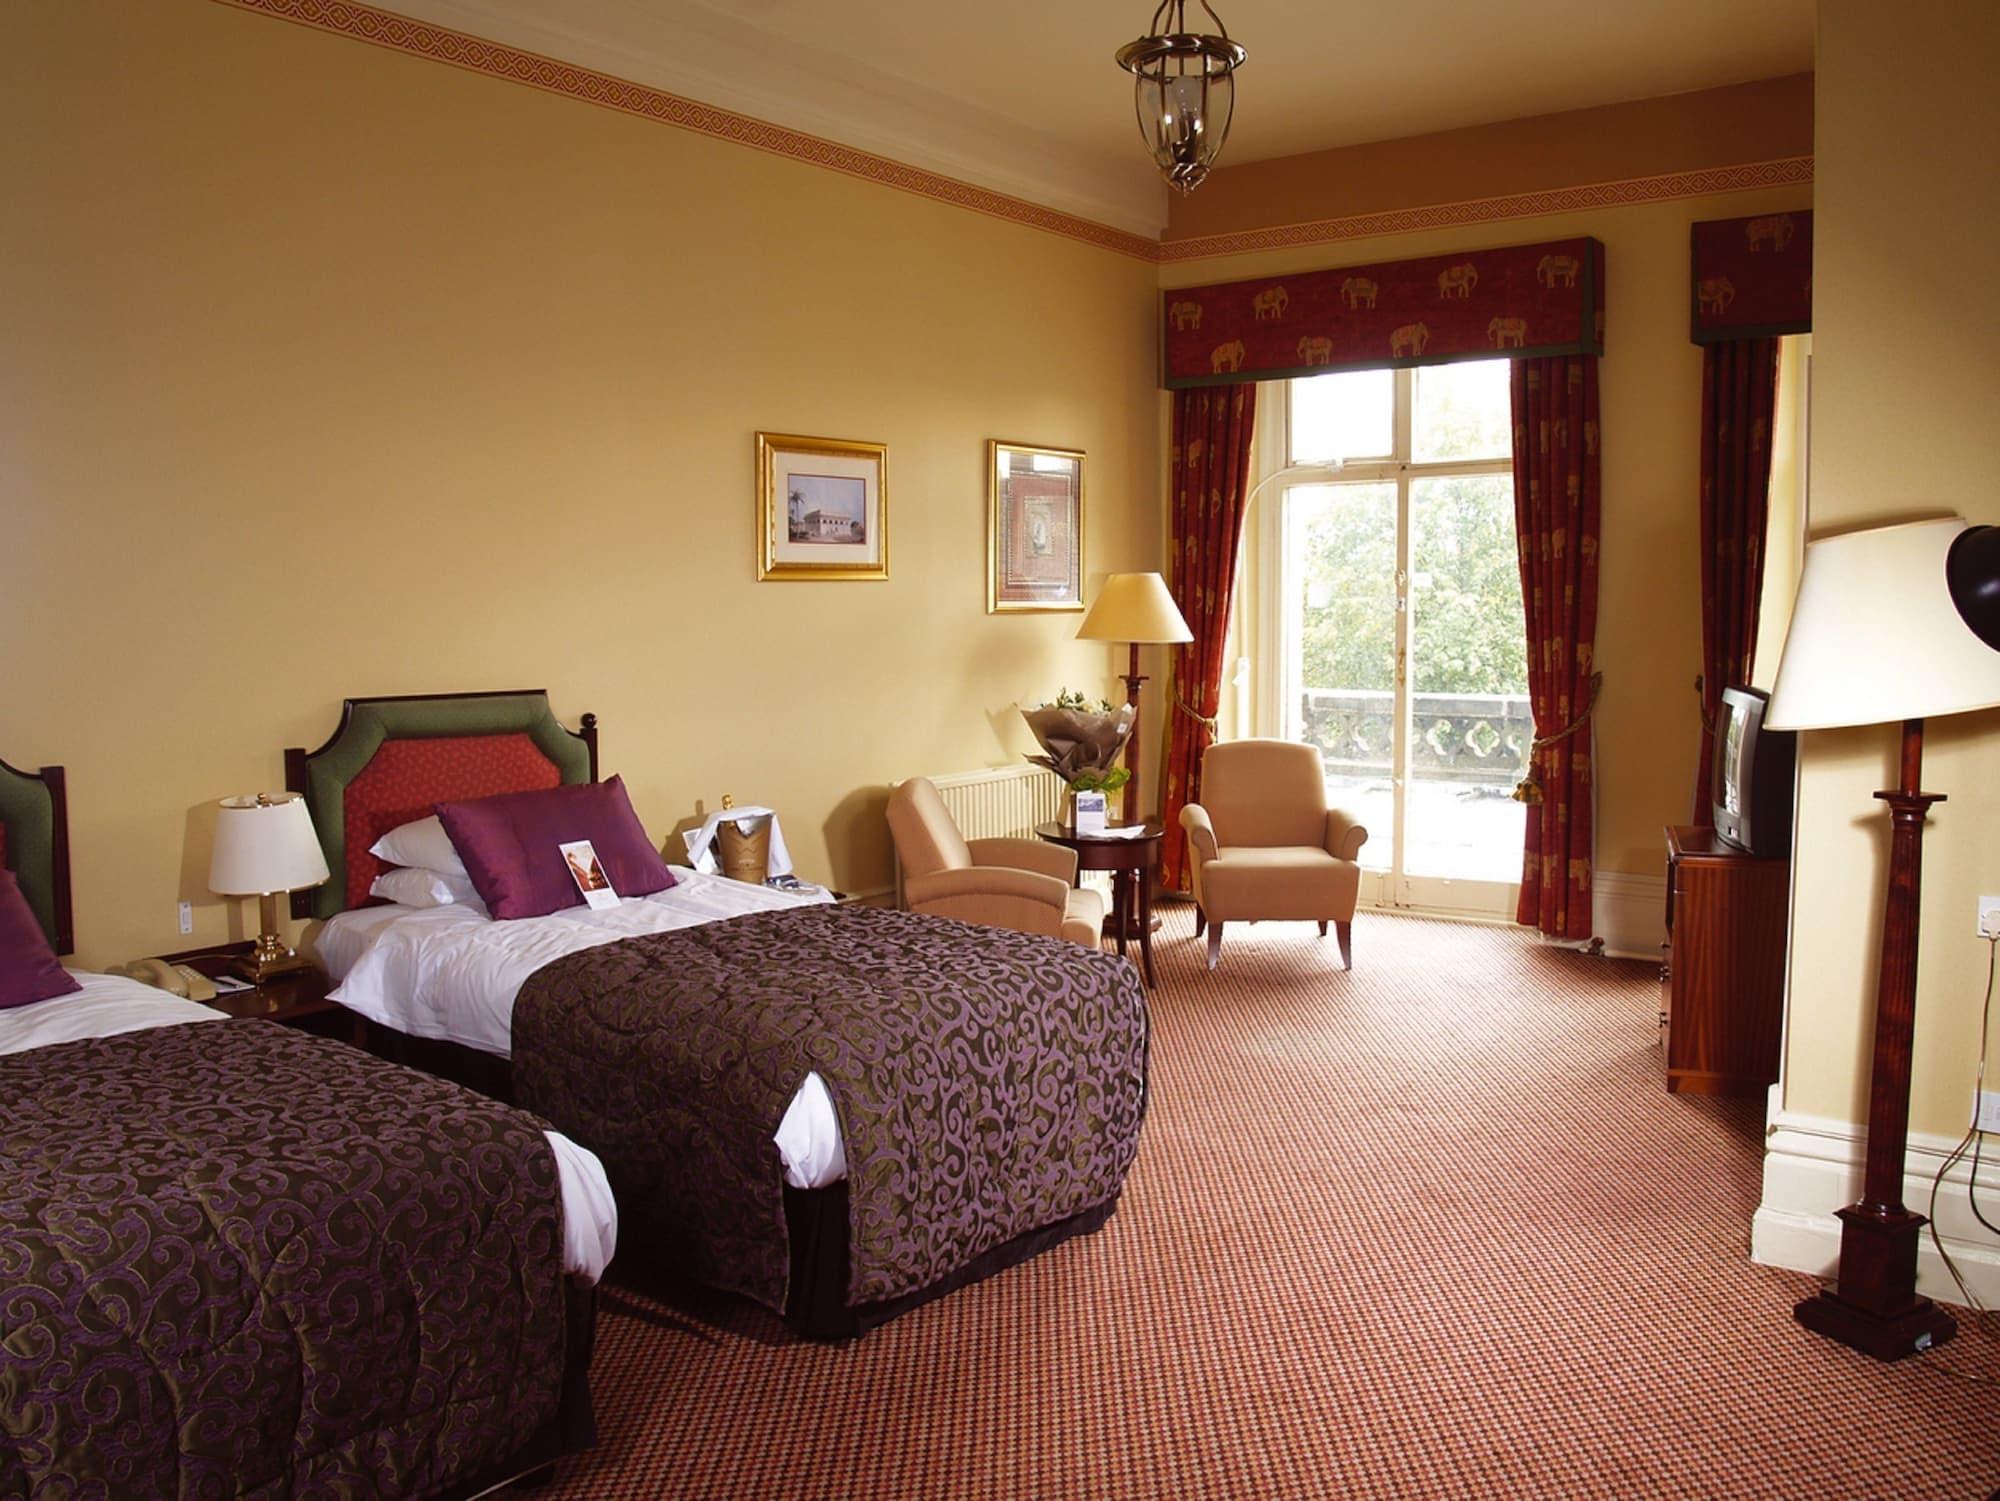 Britannia Palace Hotel Buxton & Spa, Derbyshire